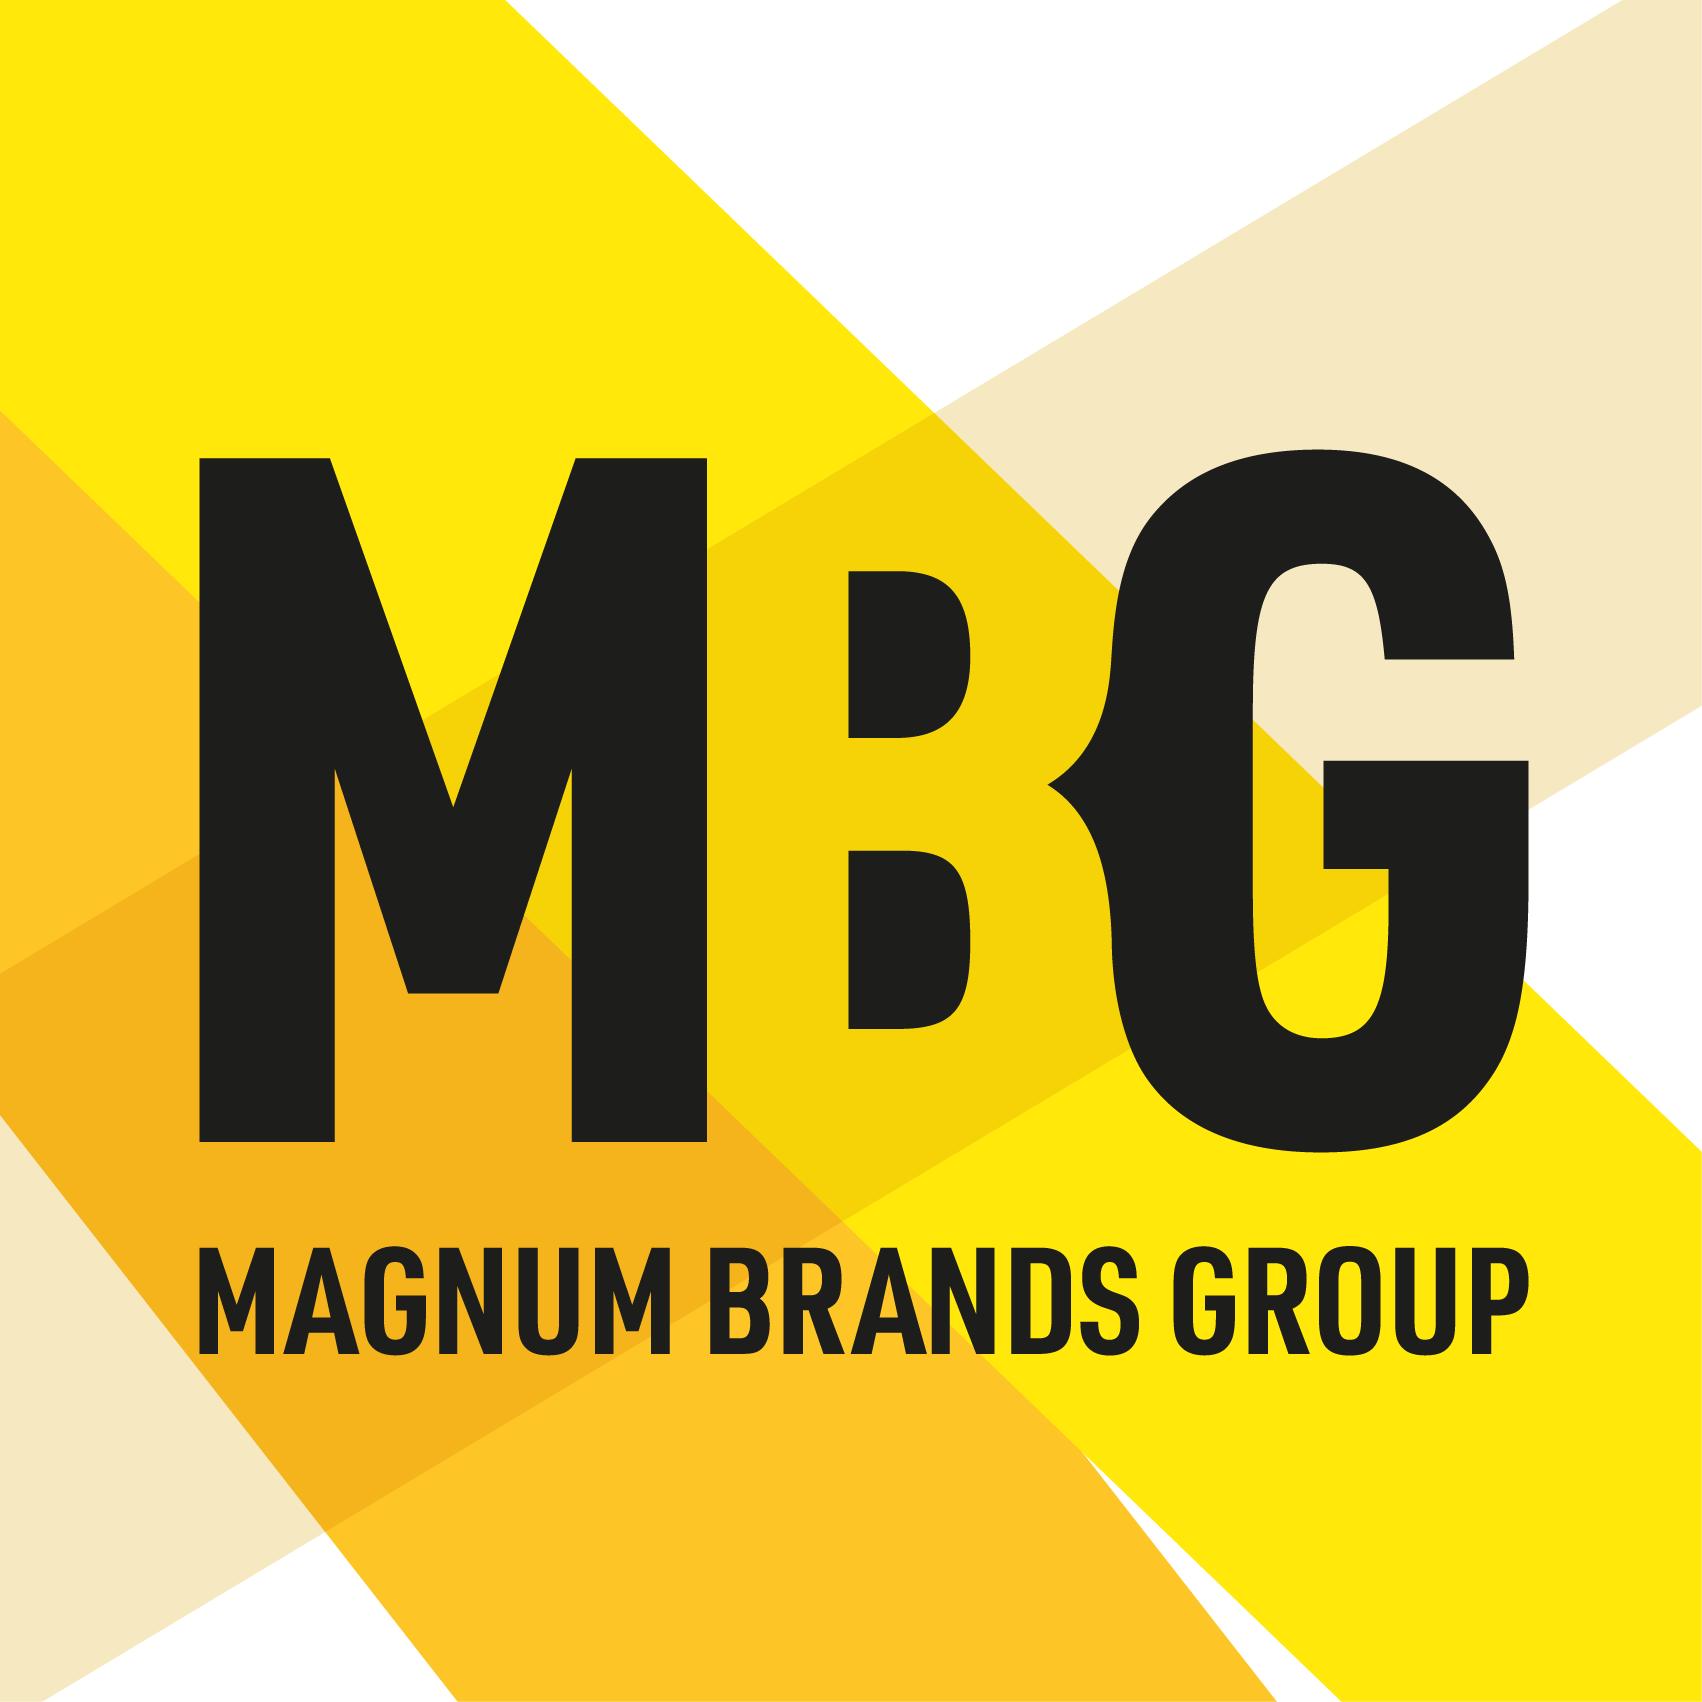 Magnum Brands Group